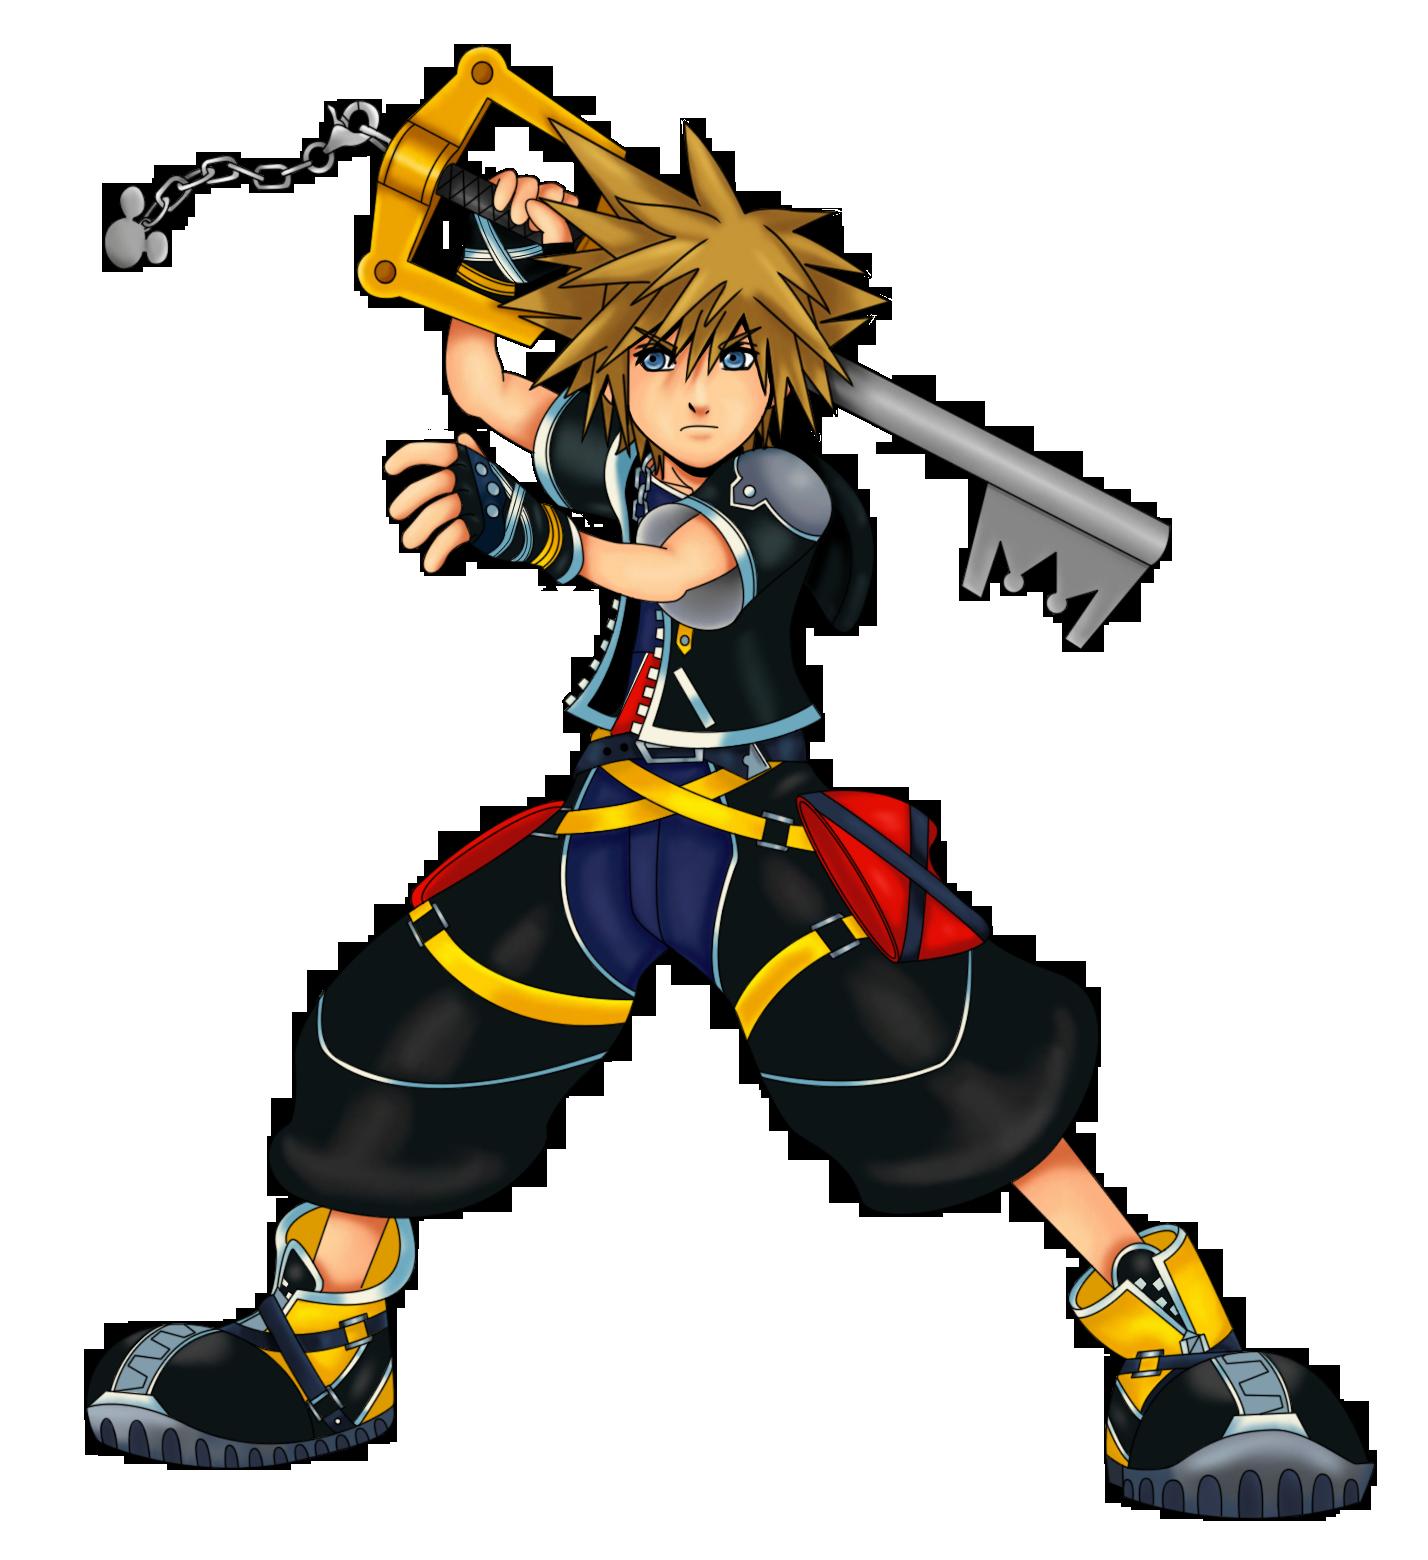 Kingdom Hearts Sora Limit Form Kingdom Hearts 3 Sora ...